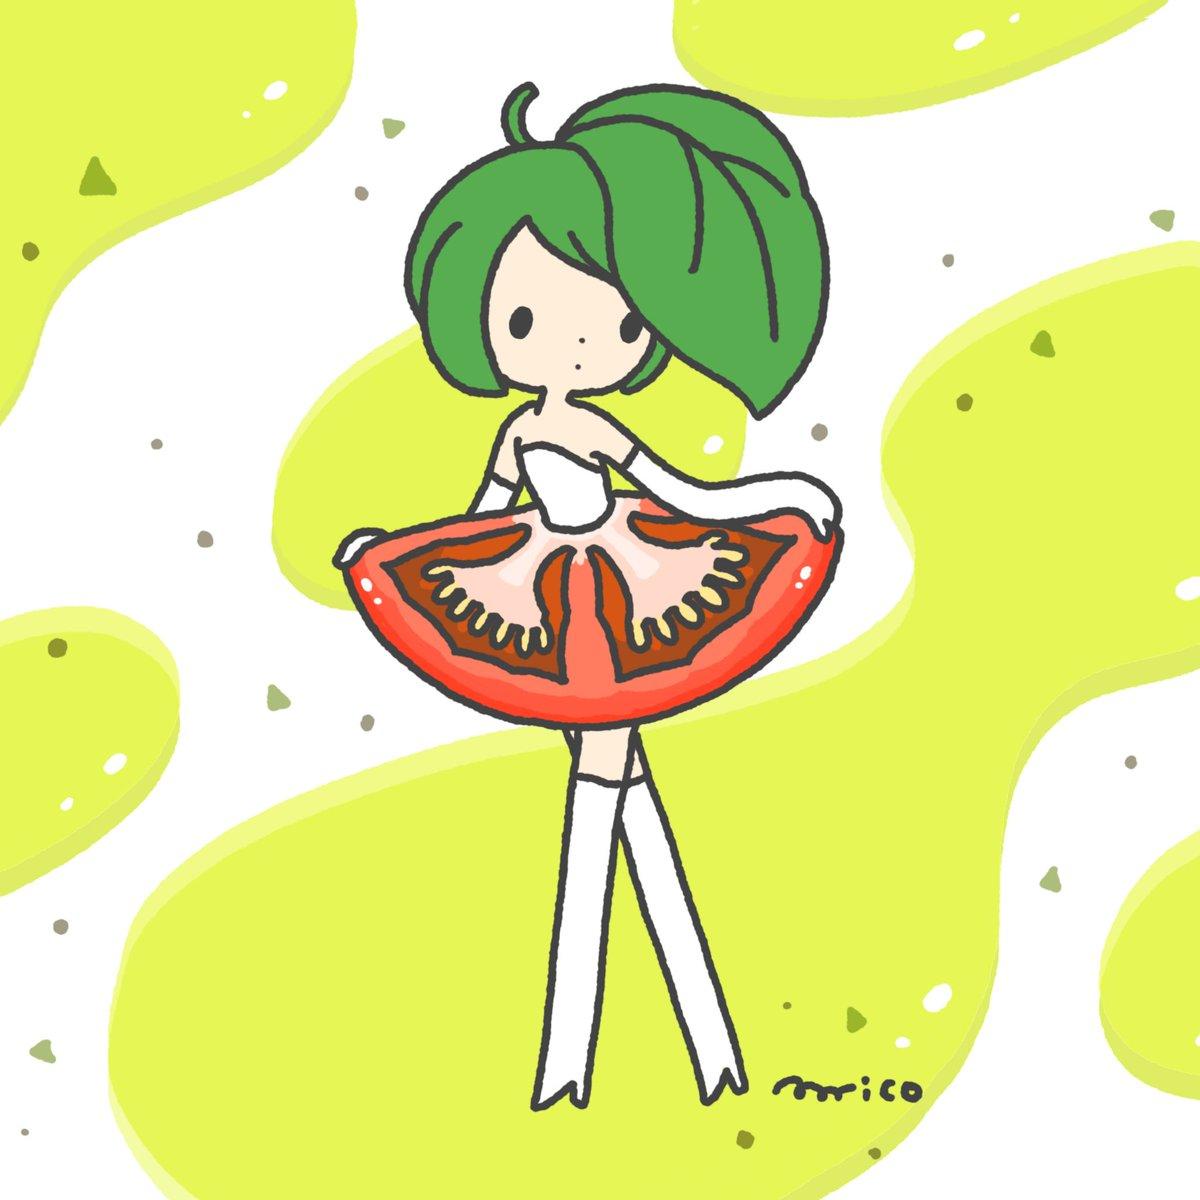 Twoucan イタリア料理の日 の注目ツイートイラストマンガ